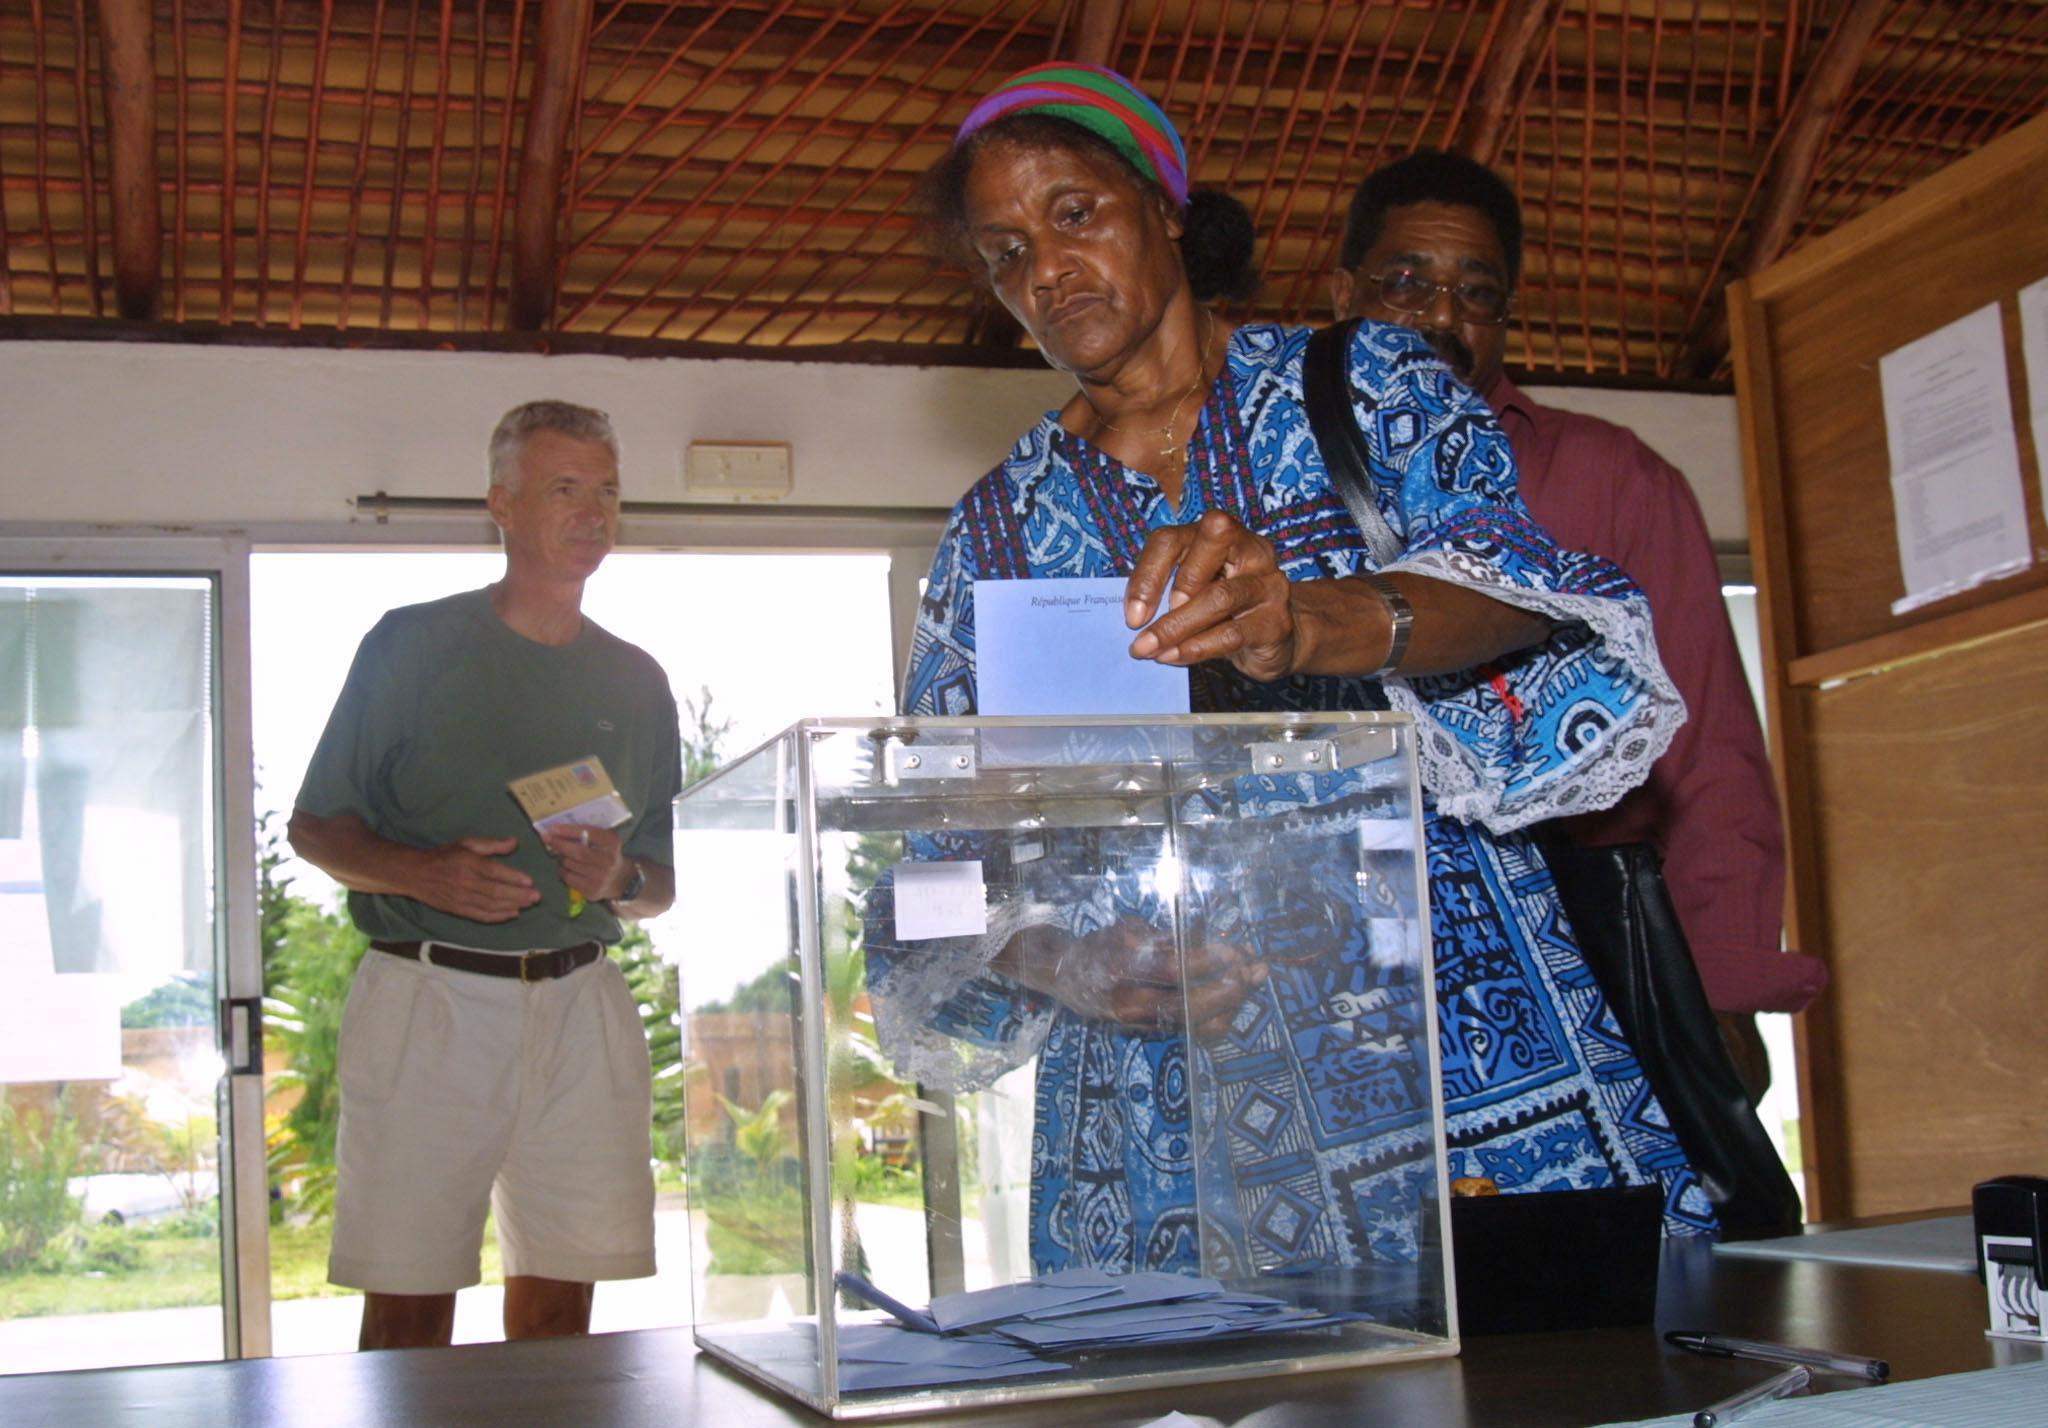 Le vote RN confirme sa progression en Outre-mer